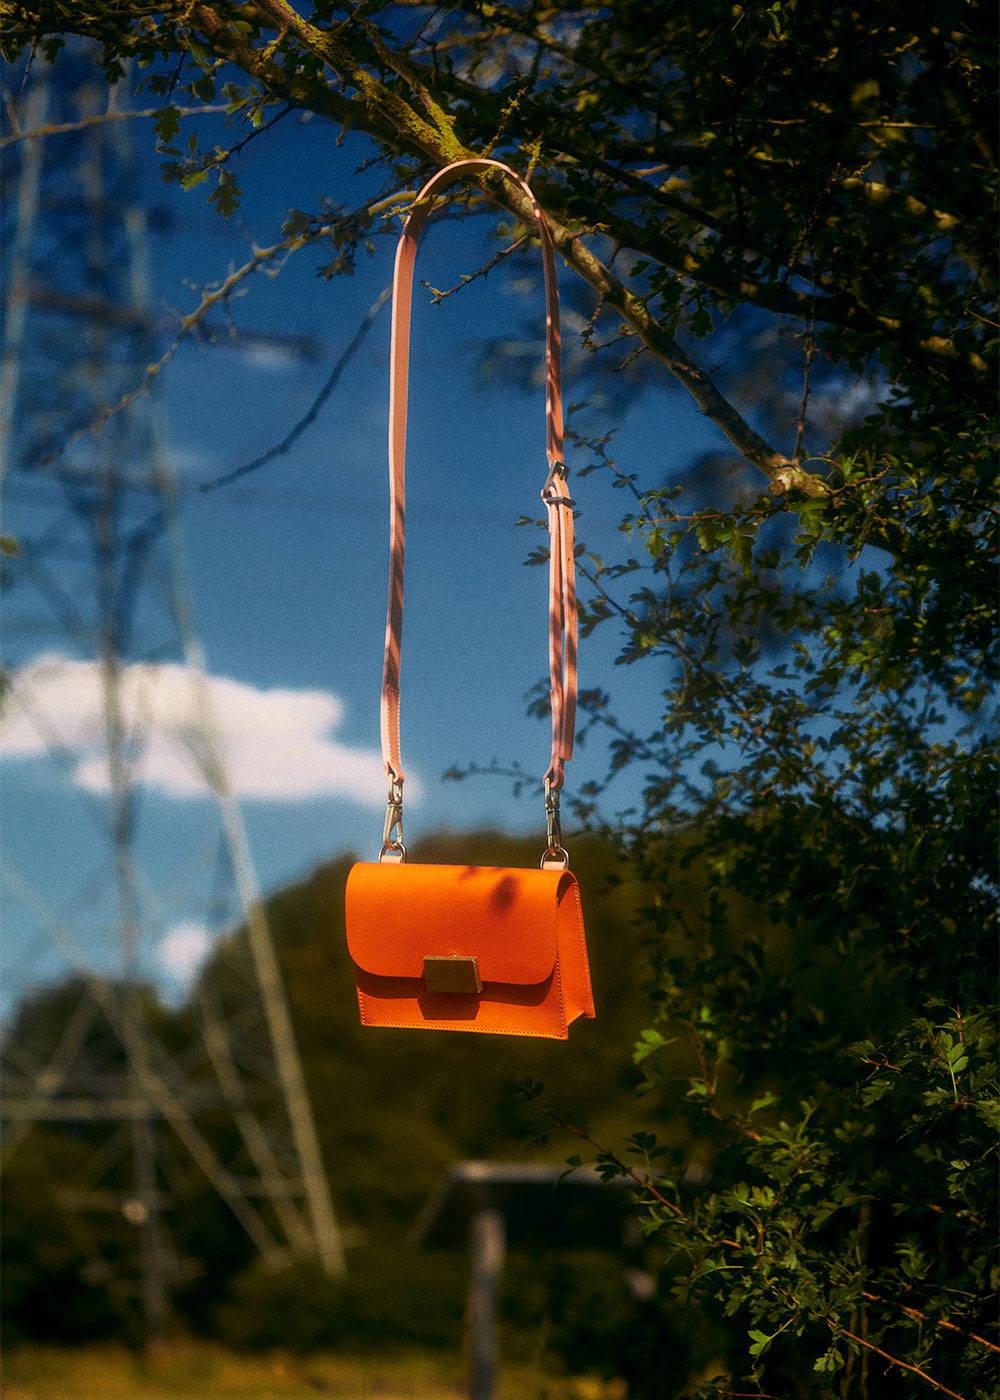 Mini Lock in Apricot